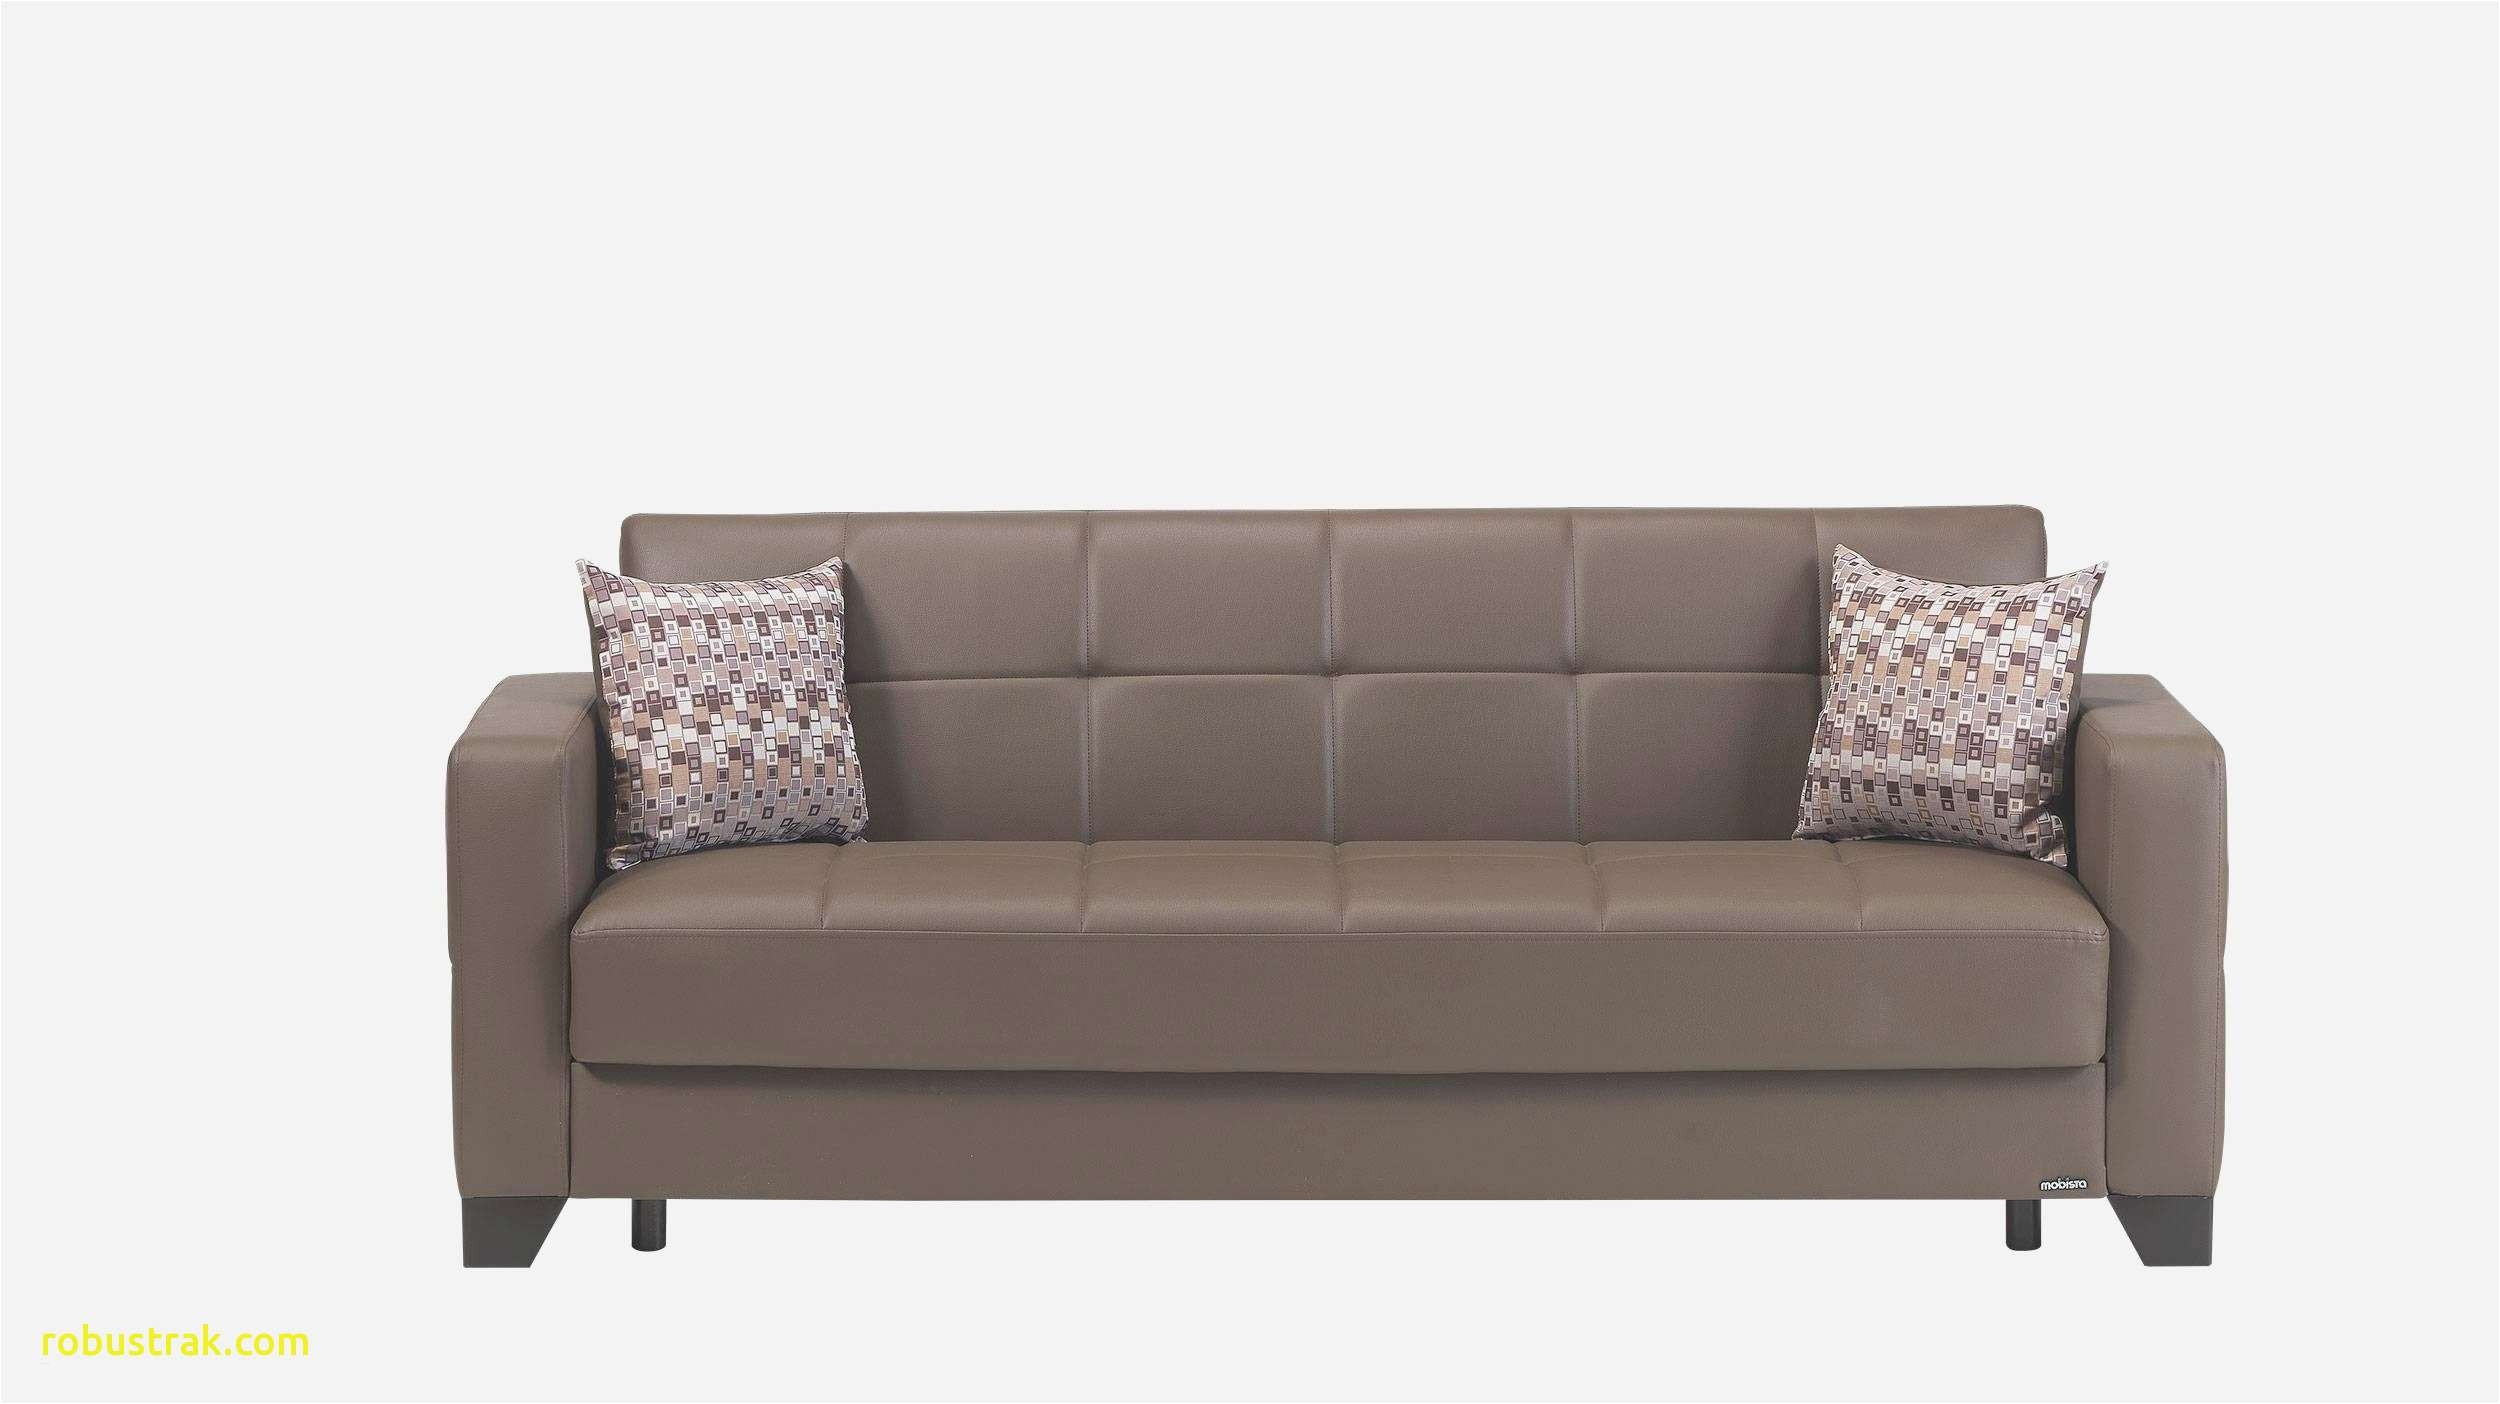 Green Sleeper sofa 15 Shiny Brown Fabric sofa